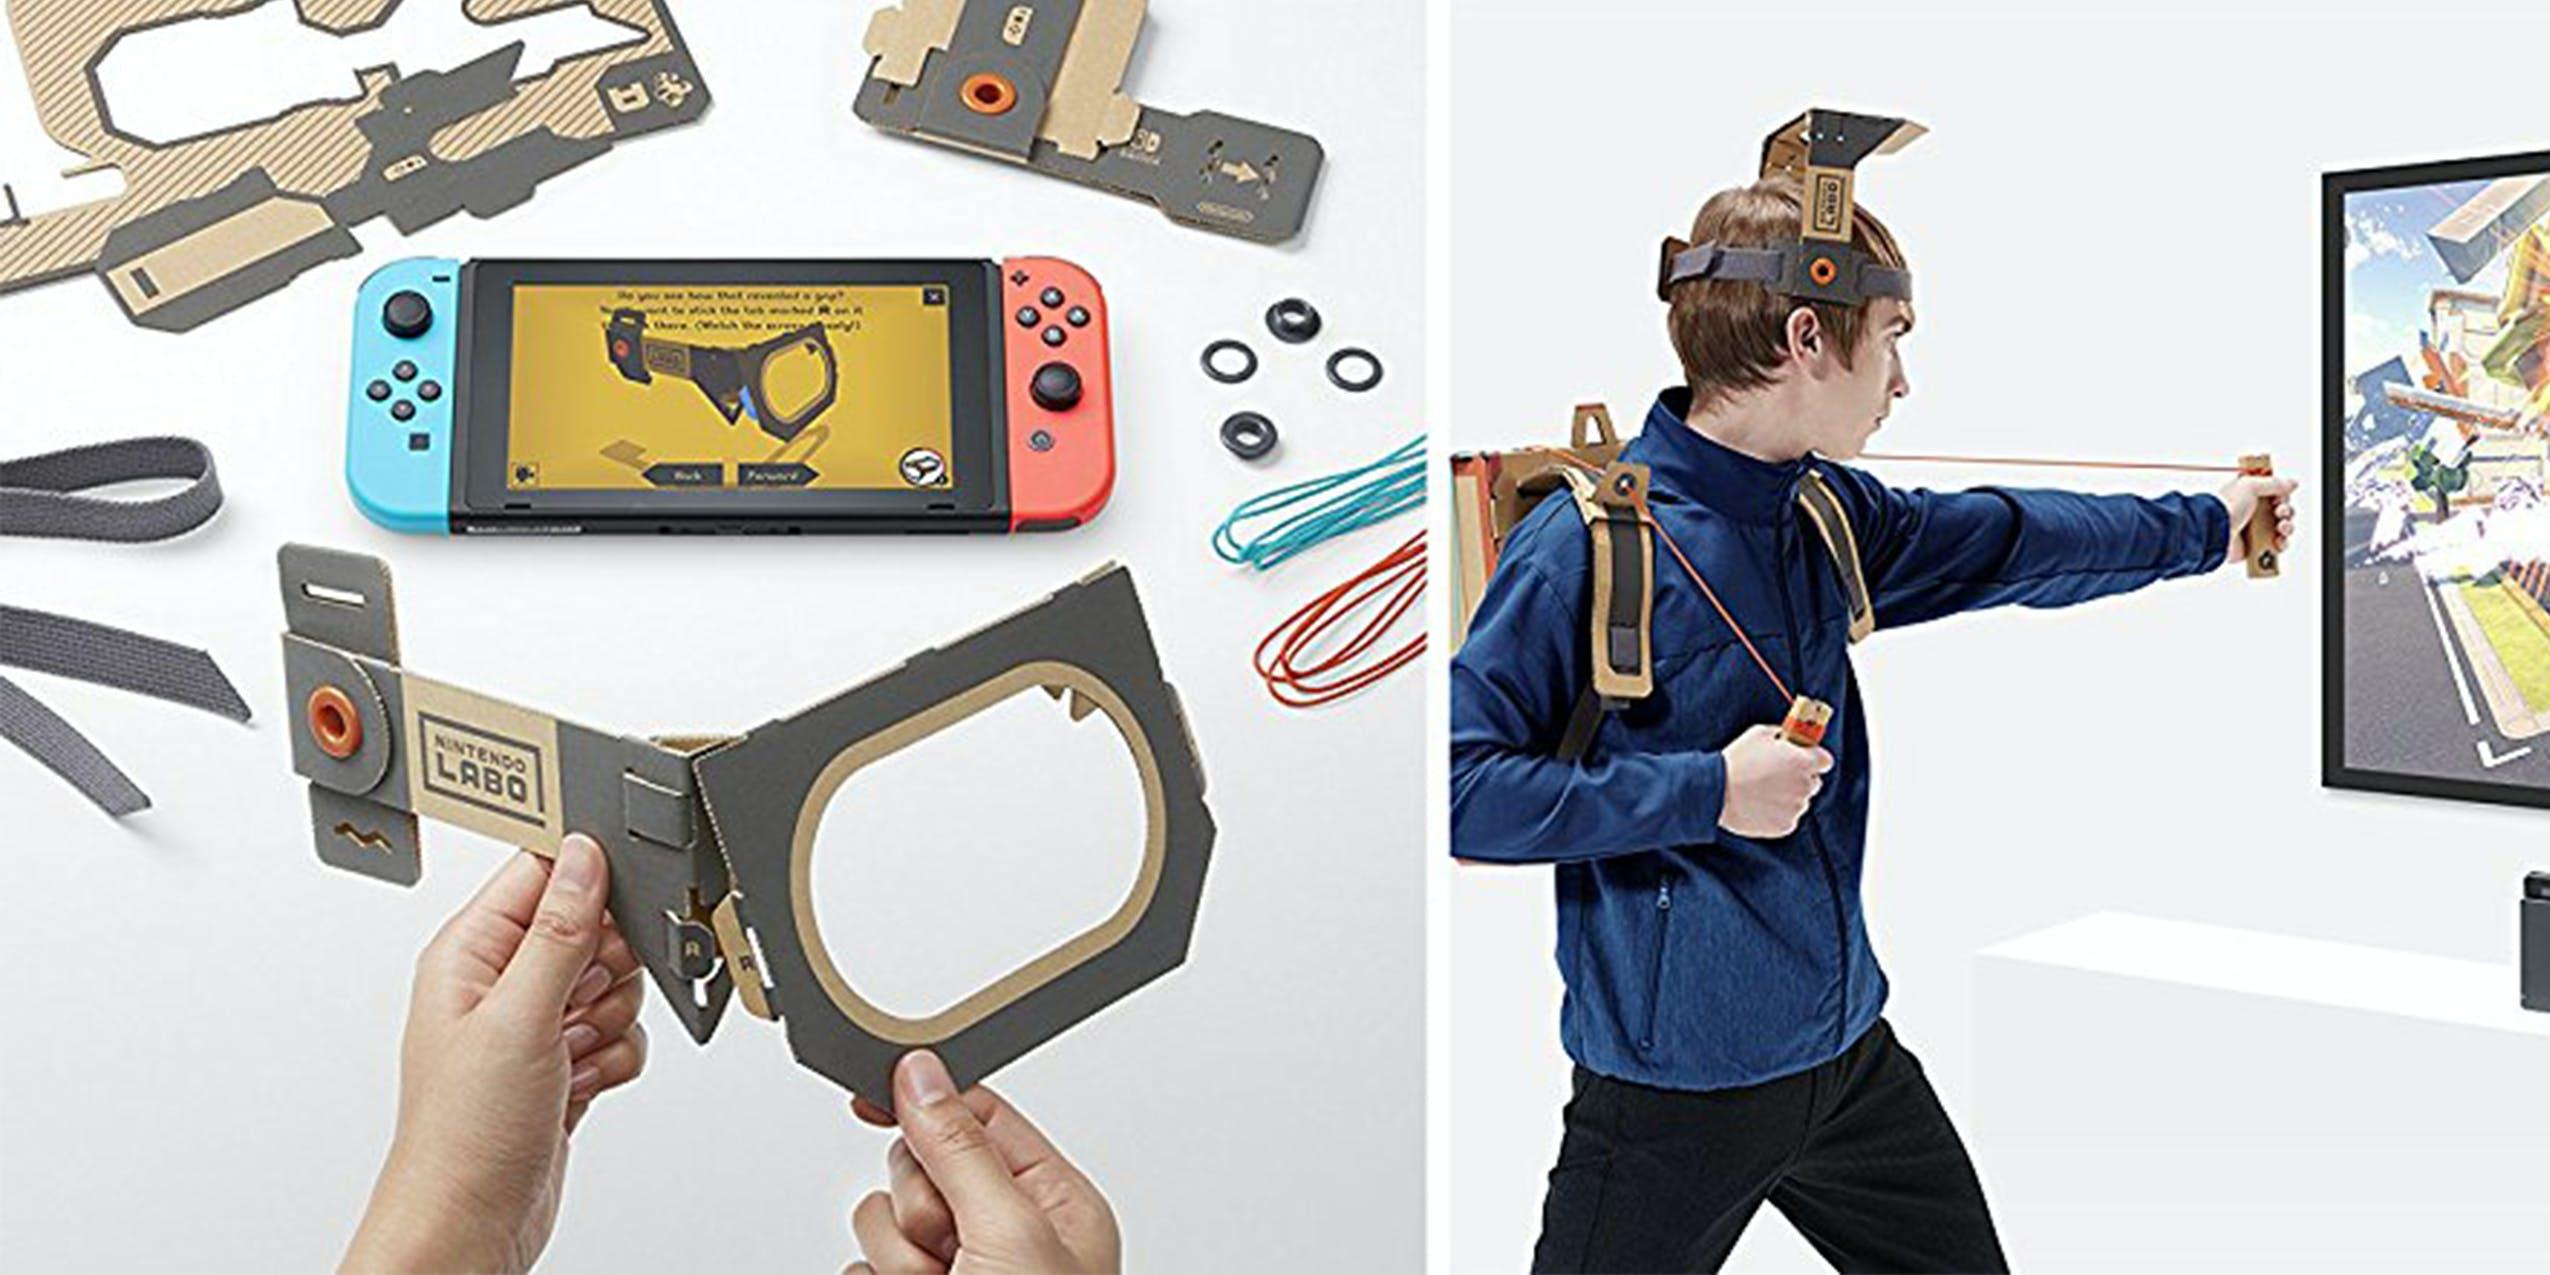 Nintendo switch release April